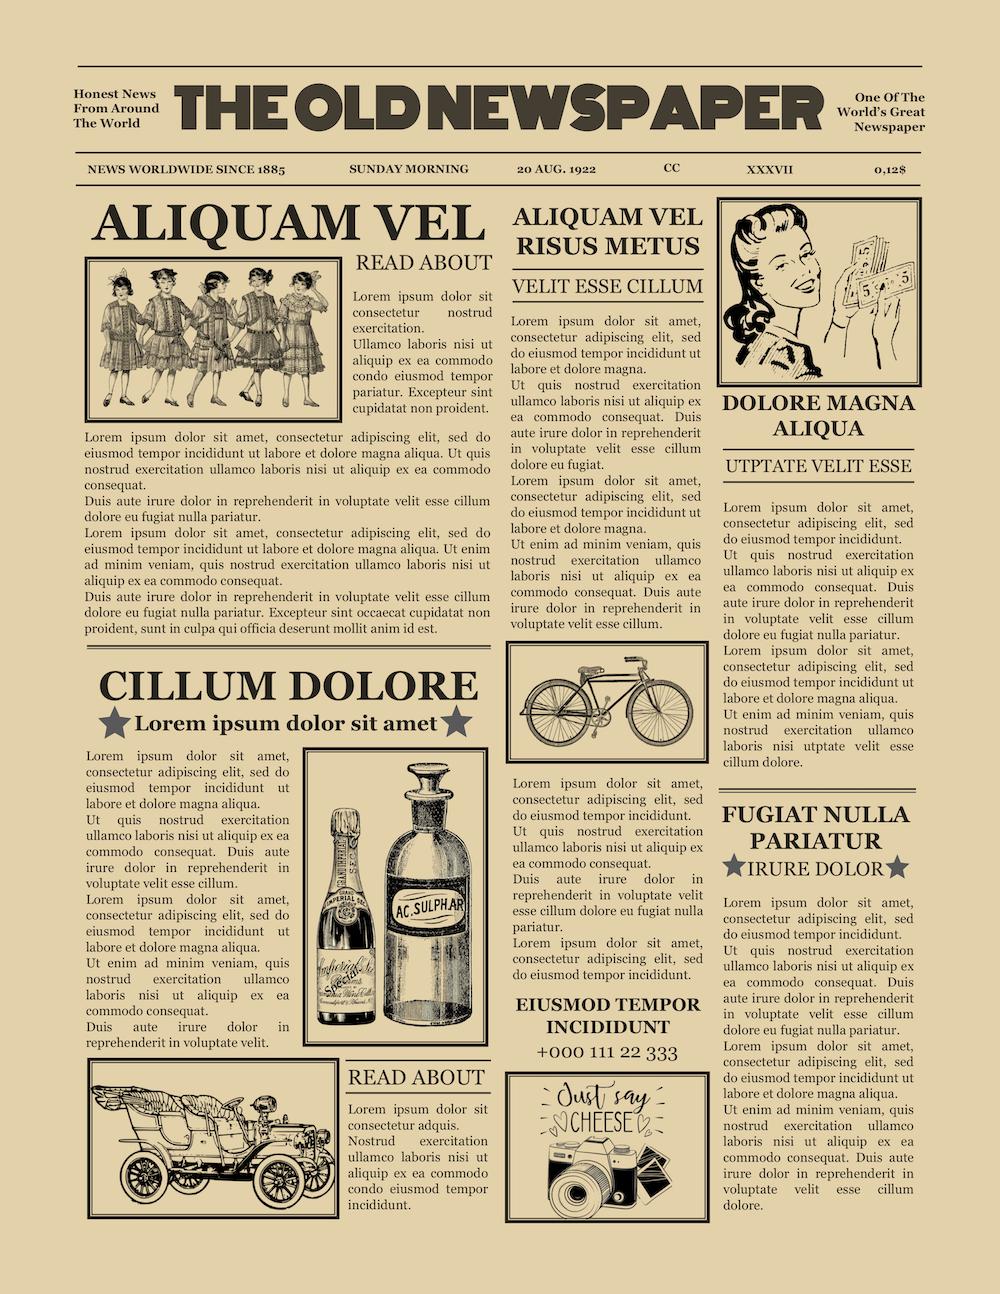 012 Free Old Newspaper Template Microsoft Word Ideas Vintage Pertaining To Old Newspaper Template Word Free